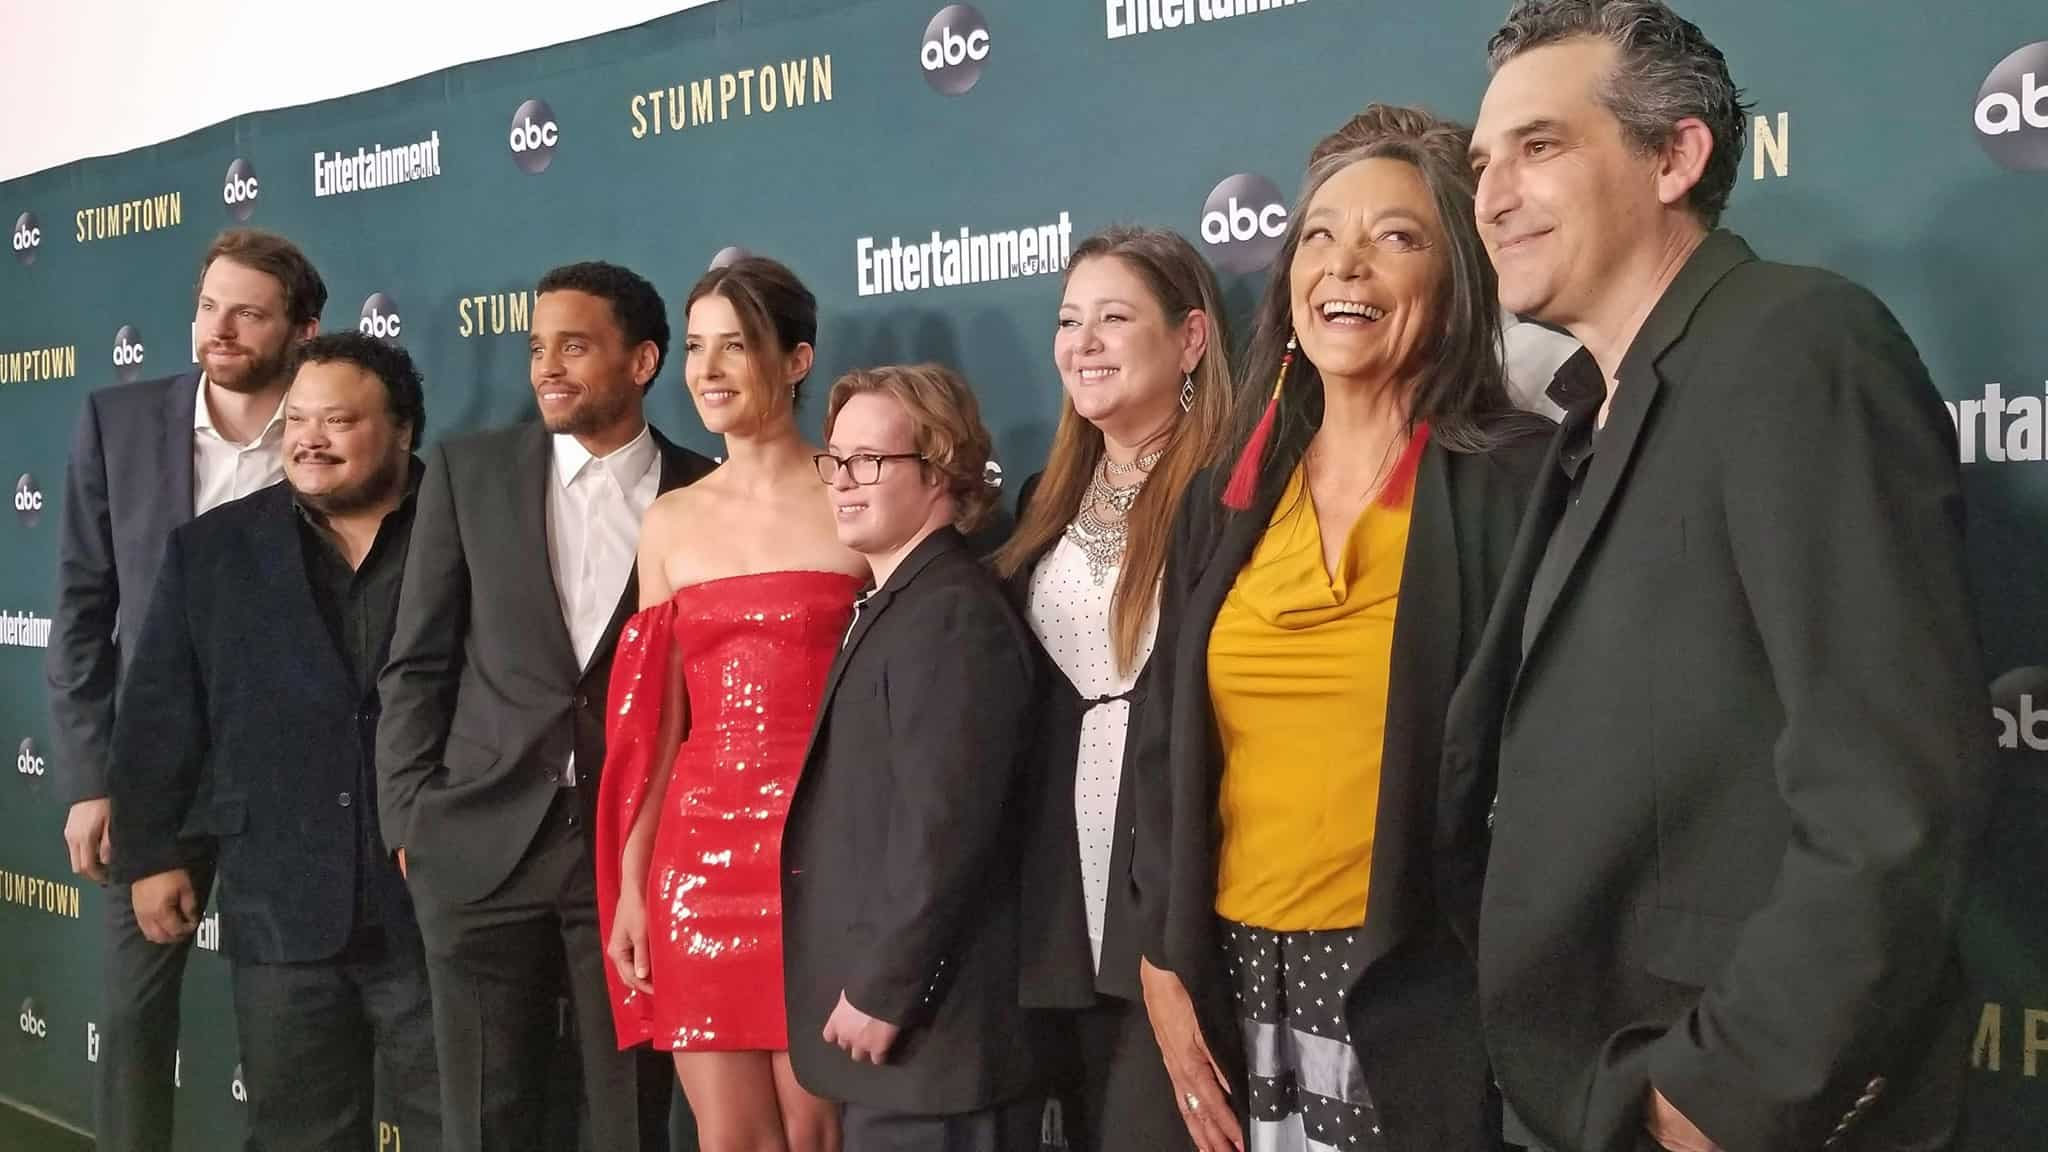 New Stumptown Tv Show On Abc Makes Monday Nights Better